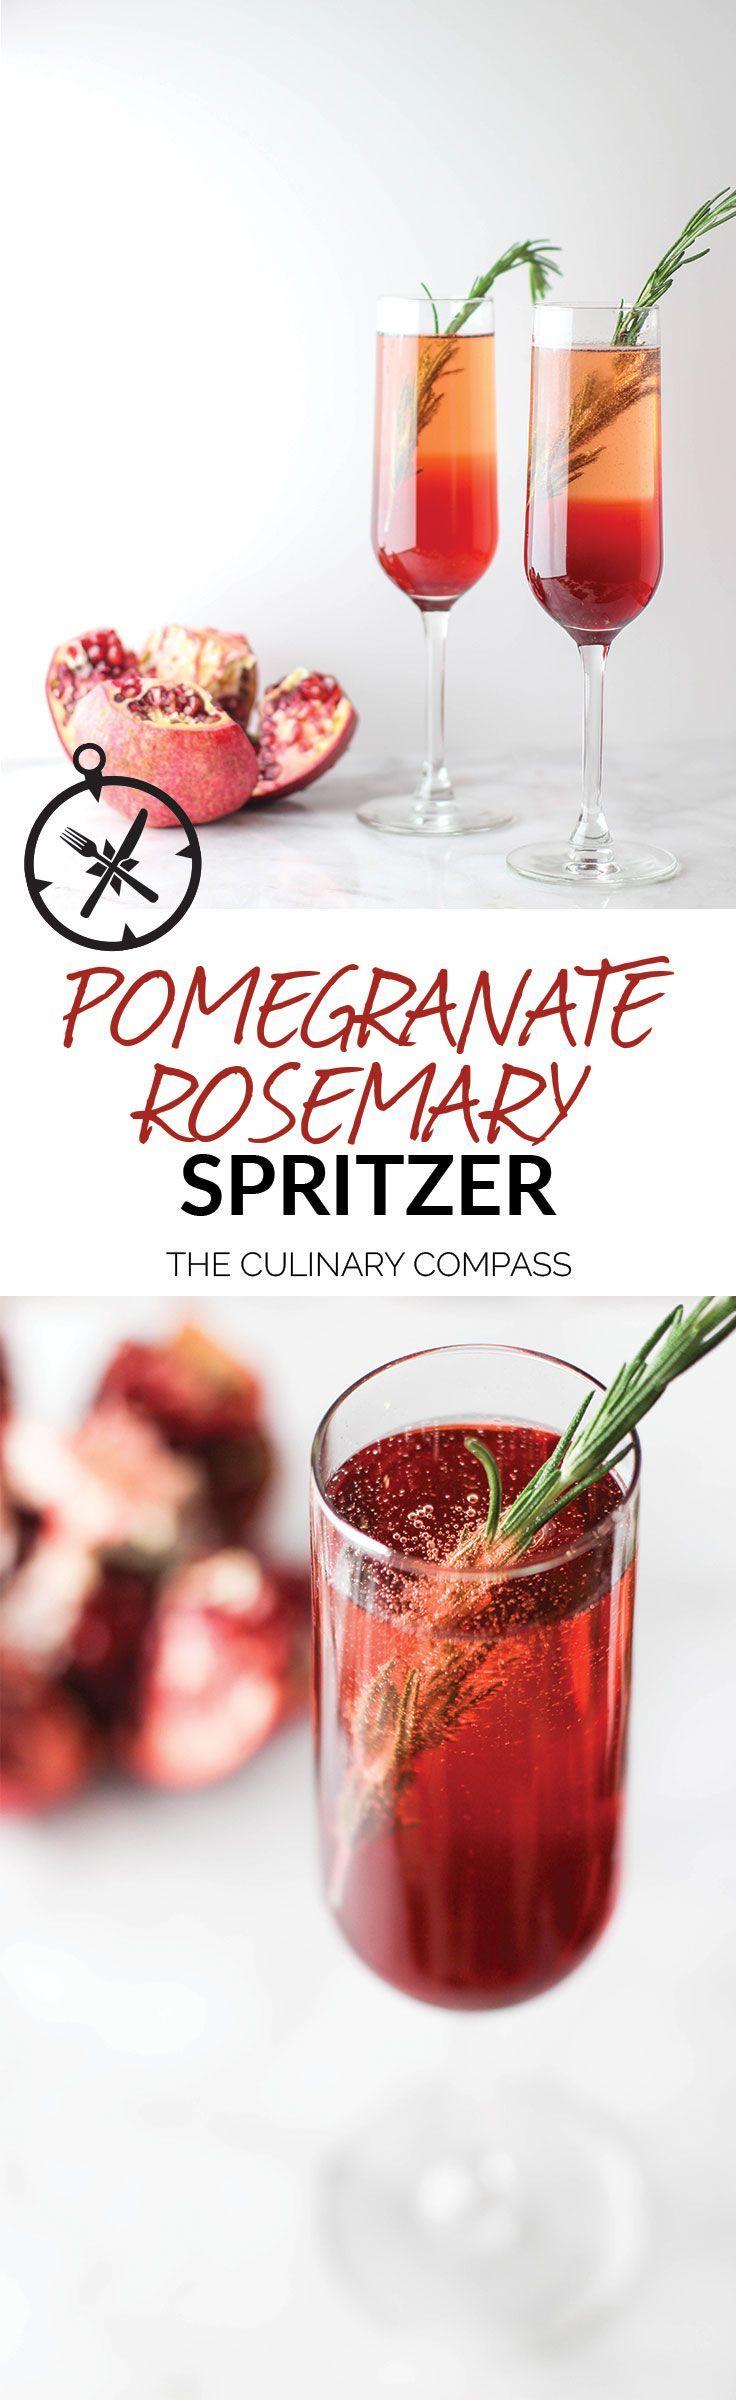 Pomegranate Rosemary Spritzer via @culinarycompass